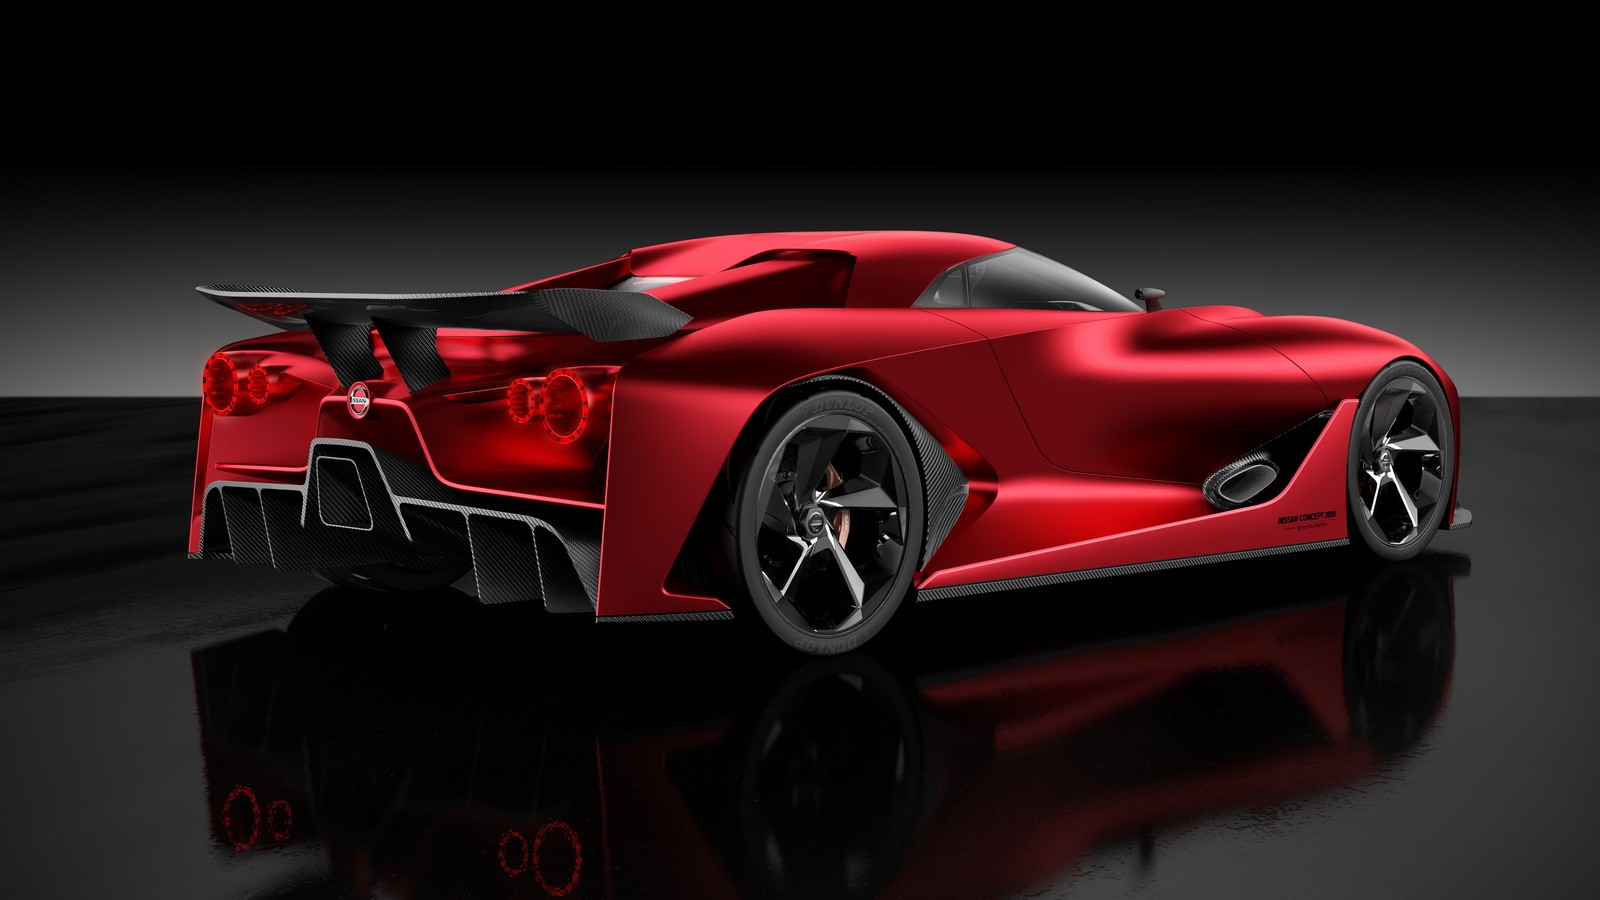 Ferrari 458 Speciale Hd Wallpaper Nissan 2020 Vision Gran Turismo Turns Quot Fire Knight Quot Red